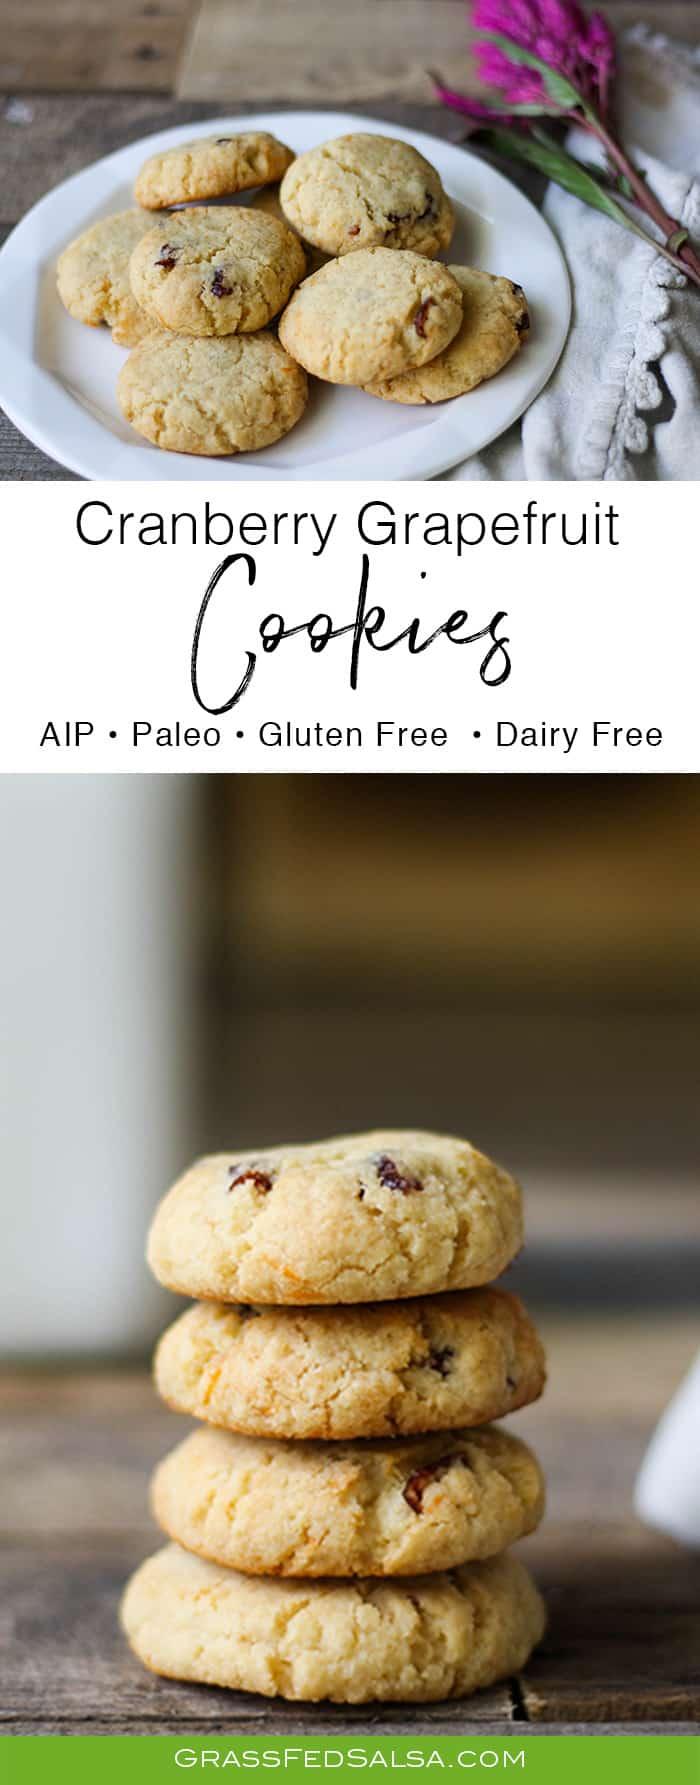 AIP Cranberry Grapefruit Cookies